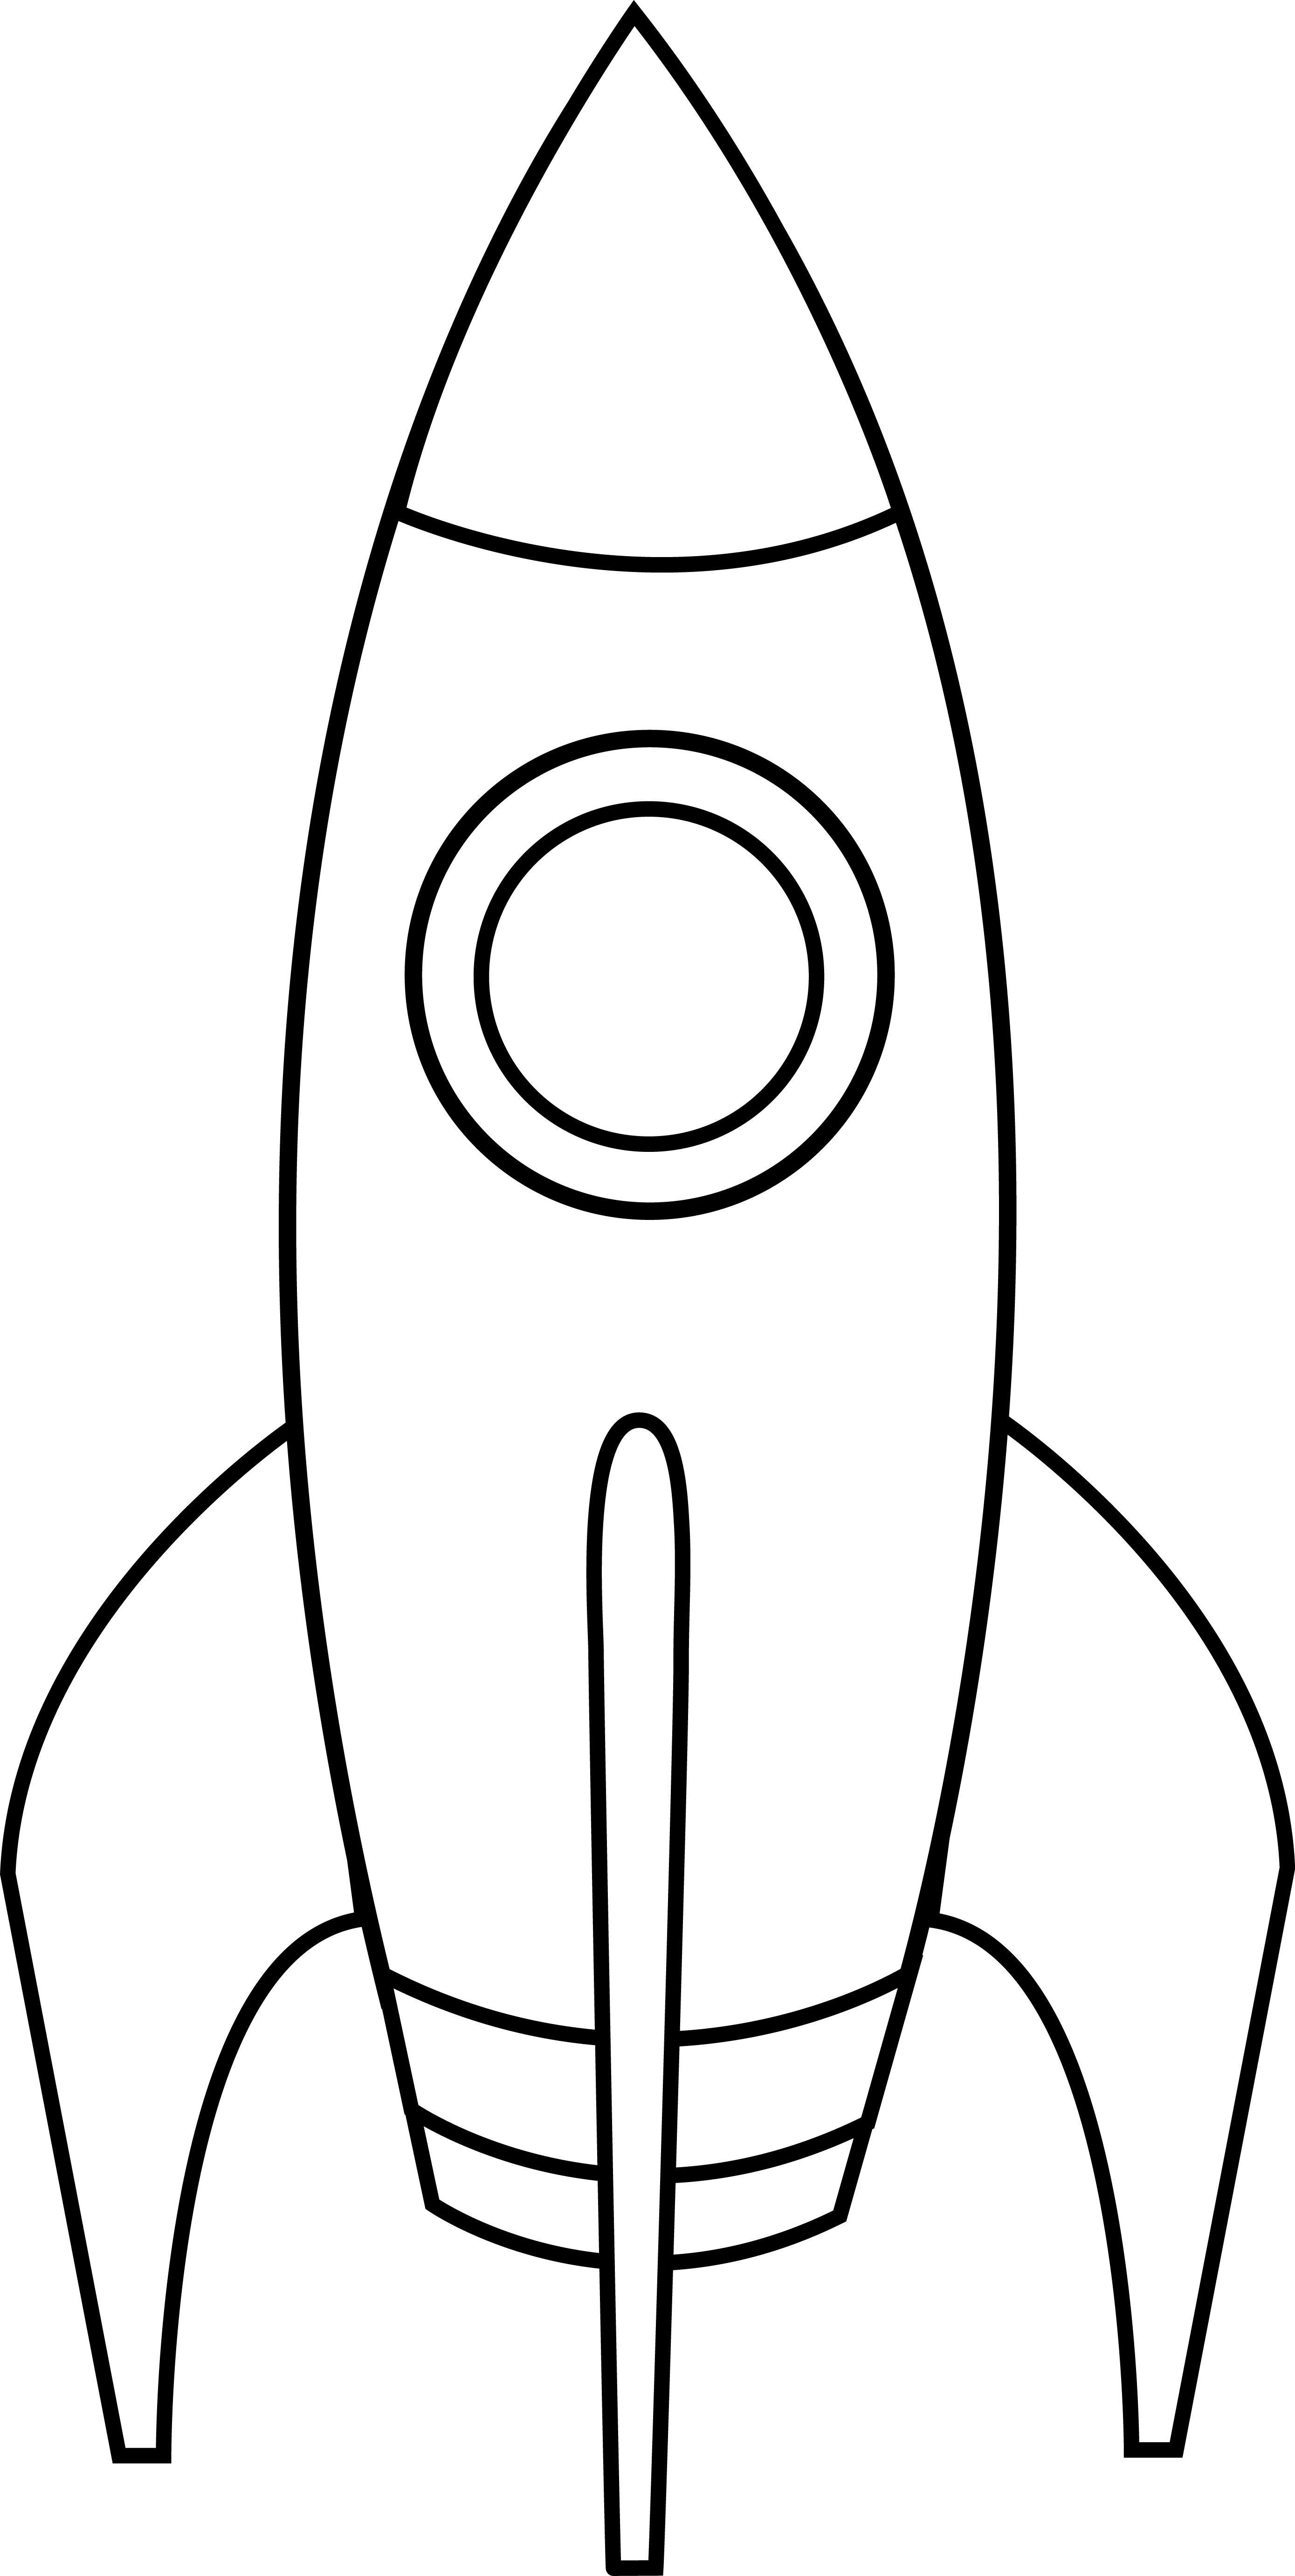 Free Rocket Ship Outline Download Free Clip Art Free